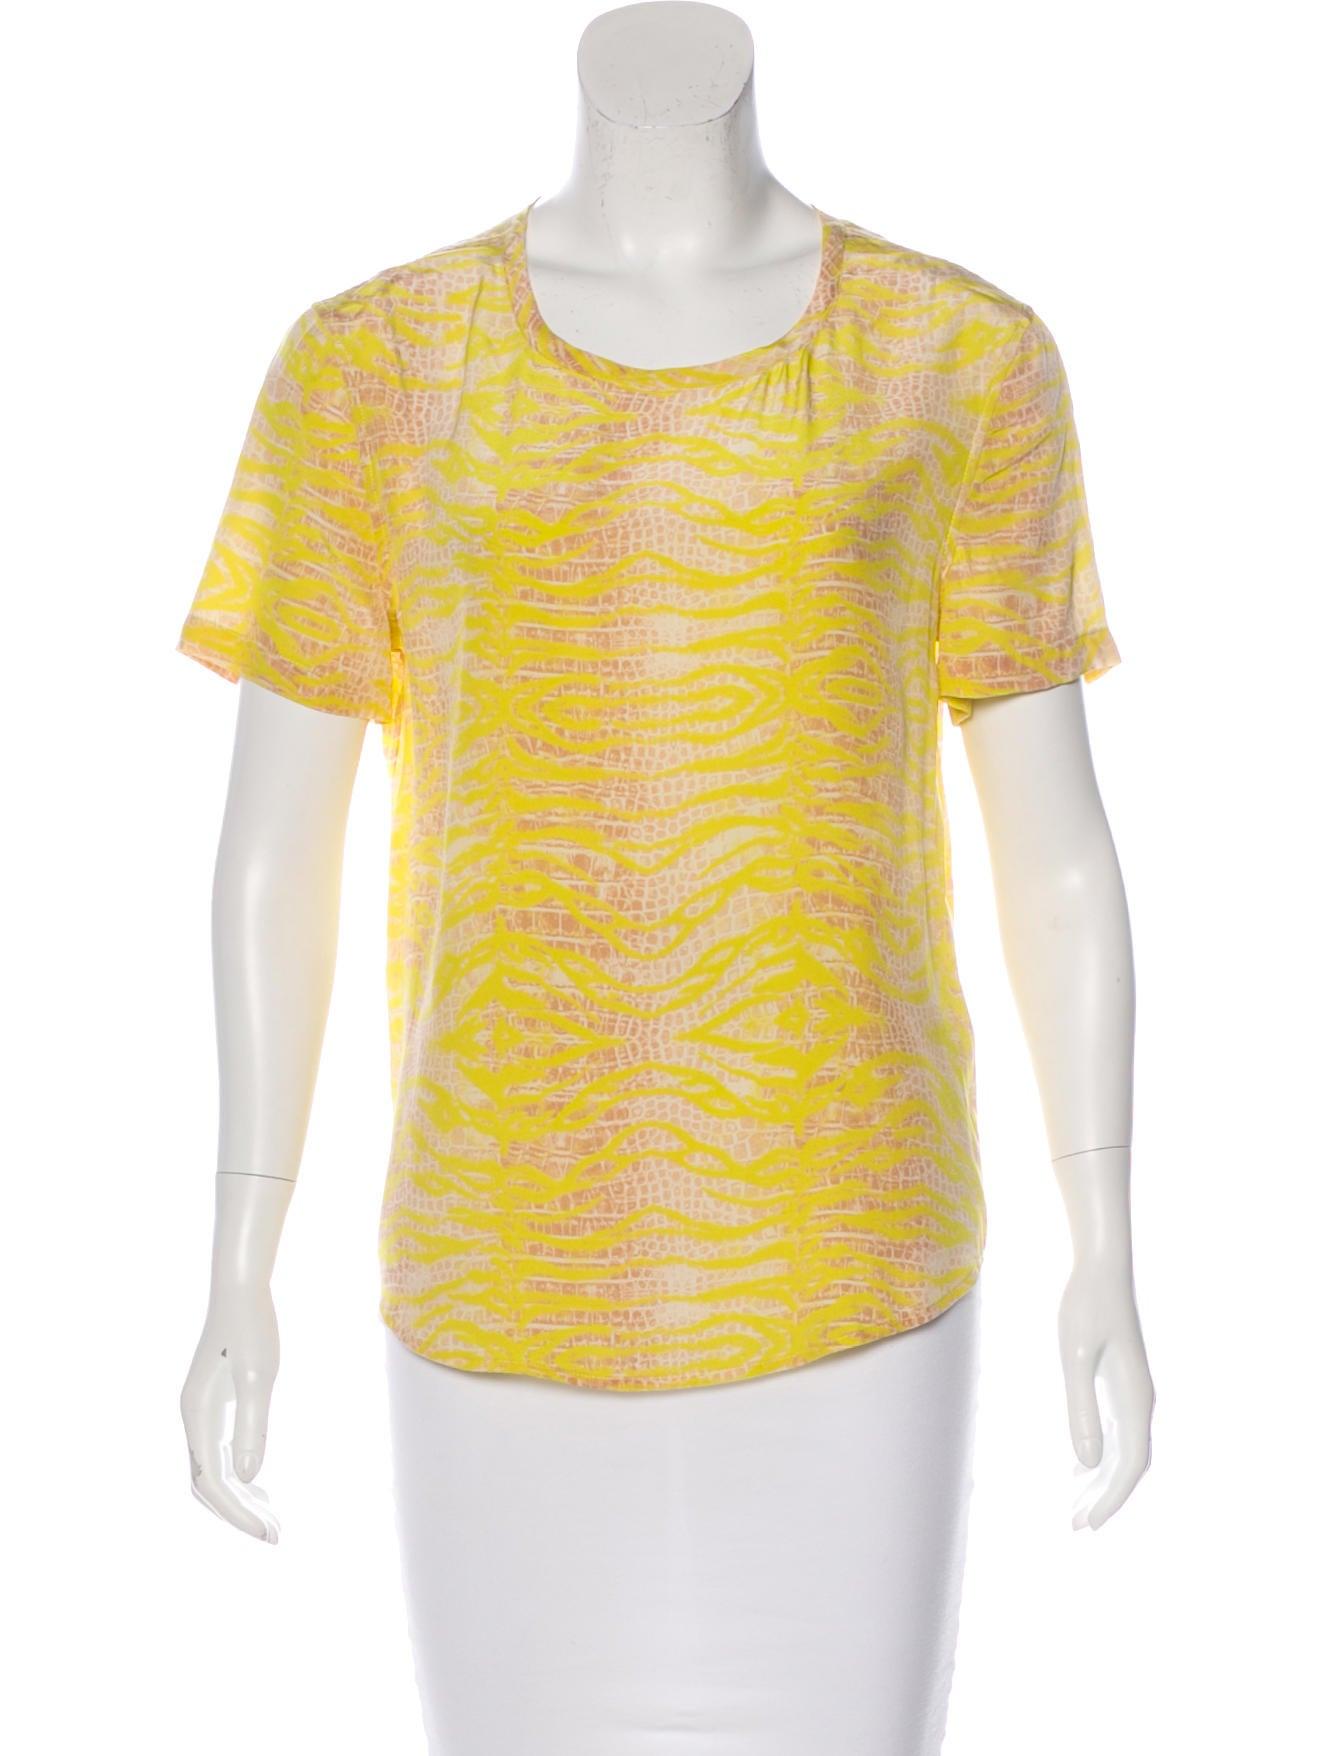 Equipment silk short sleeve t shirt clothing weq37827 for Silk short sleeve shirt